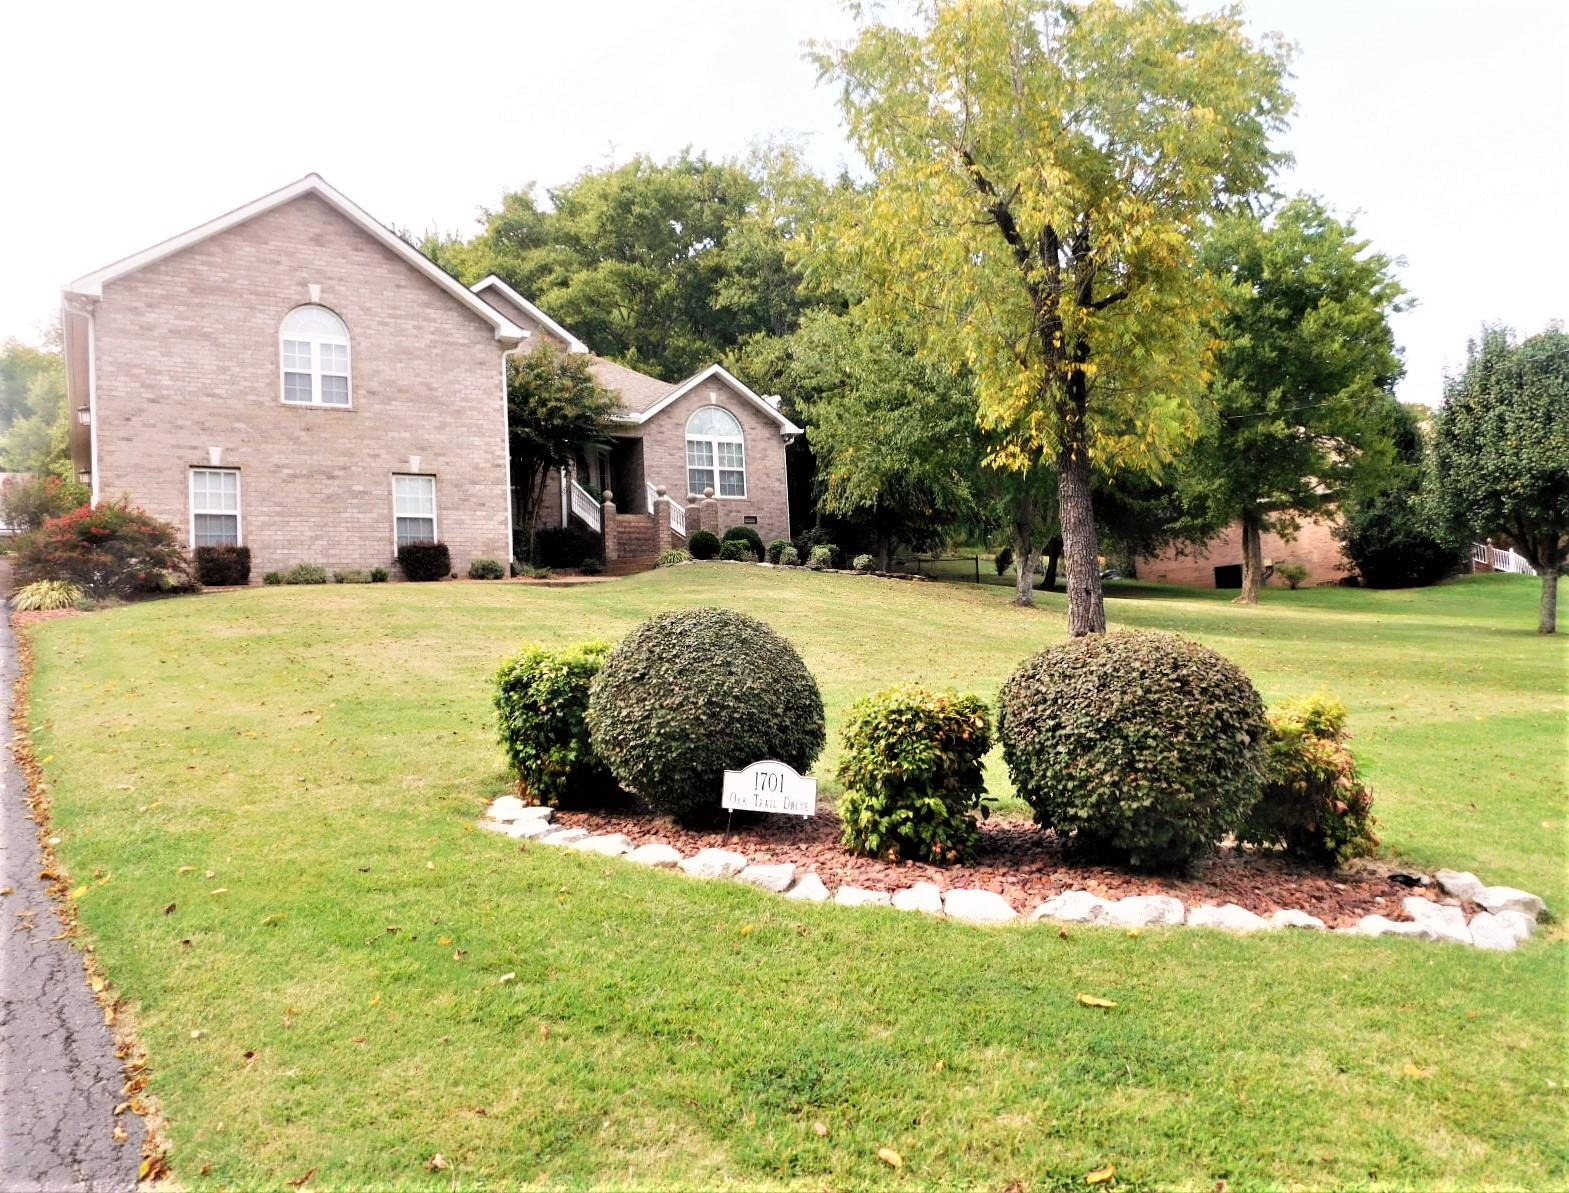 1701 Oak Trail Dr, Columbia, TN 38401 - Columbia, TN real estate listing